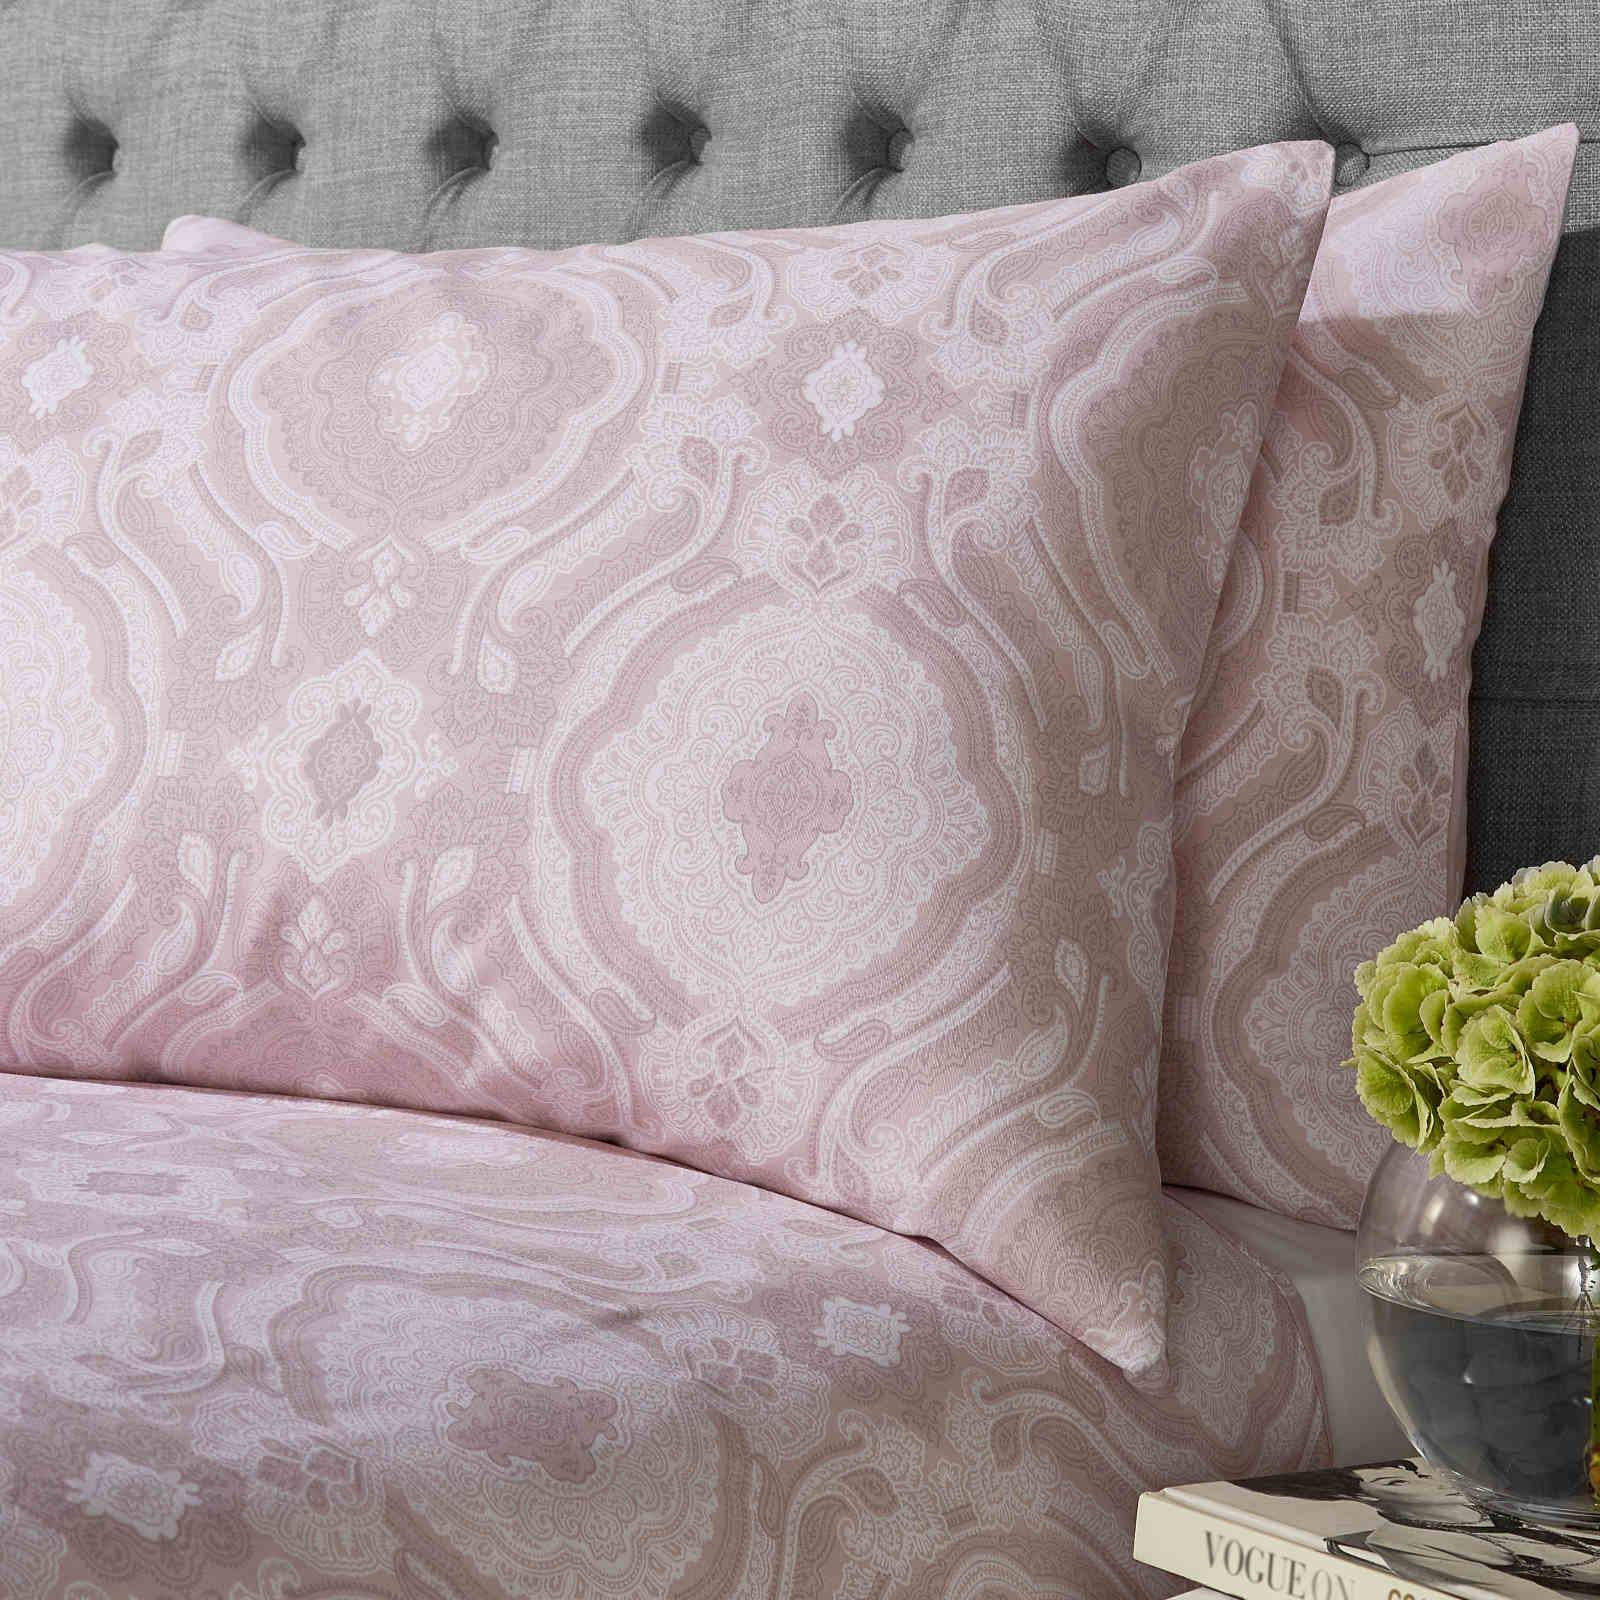 Cubierta-Edredon-Rosa-Blush-Rose-Impreso-juego-De-Edredon-Conjuntos-de-Cama-cubre-Jacquard miniatura 9